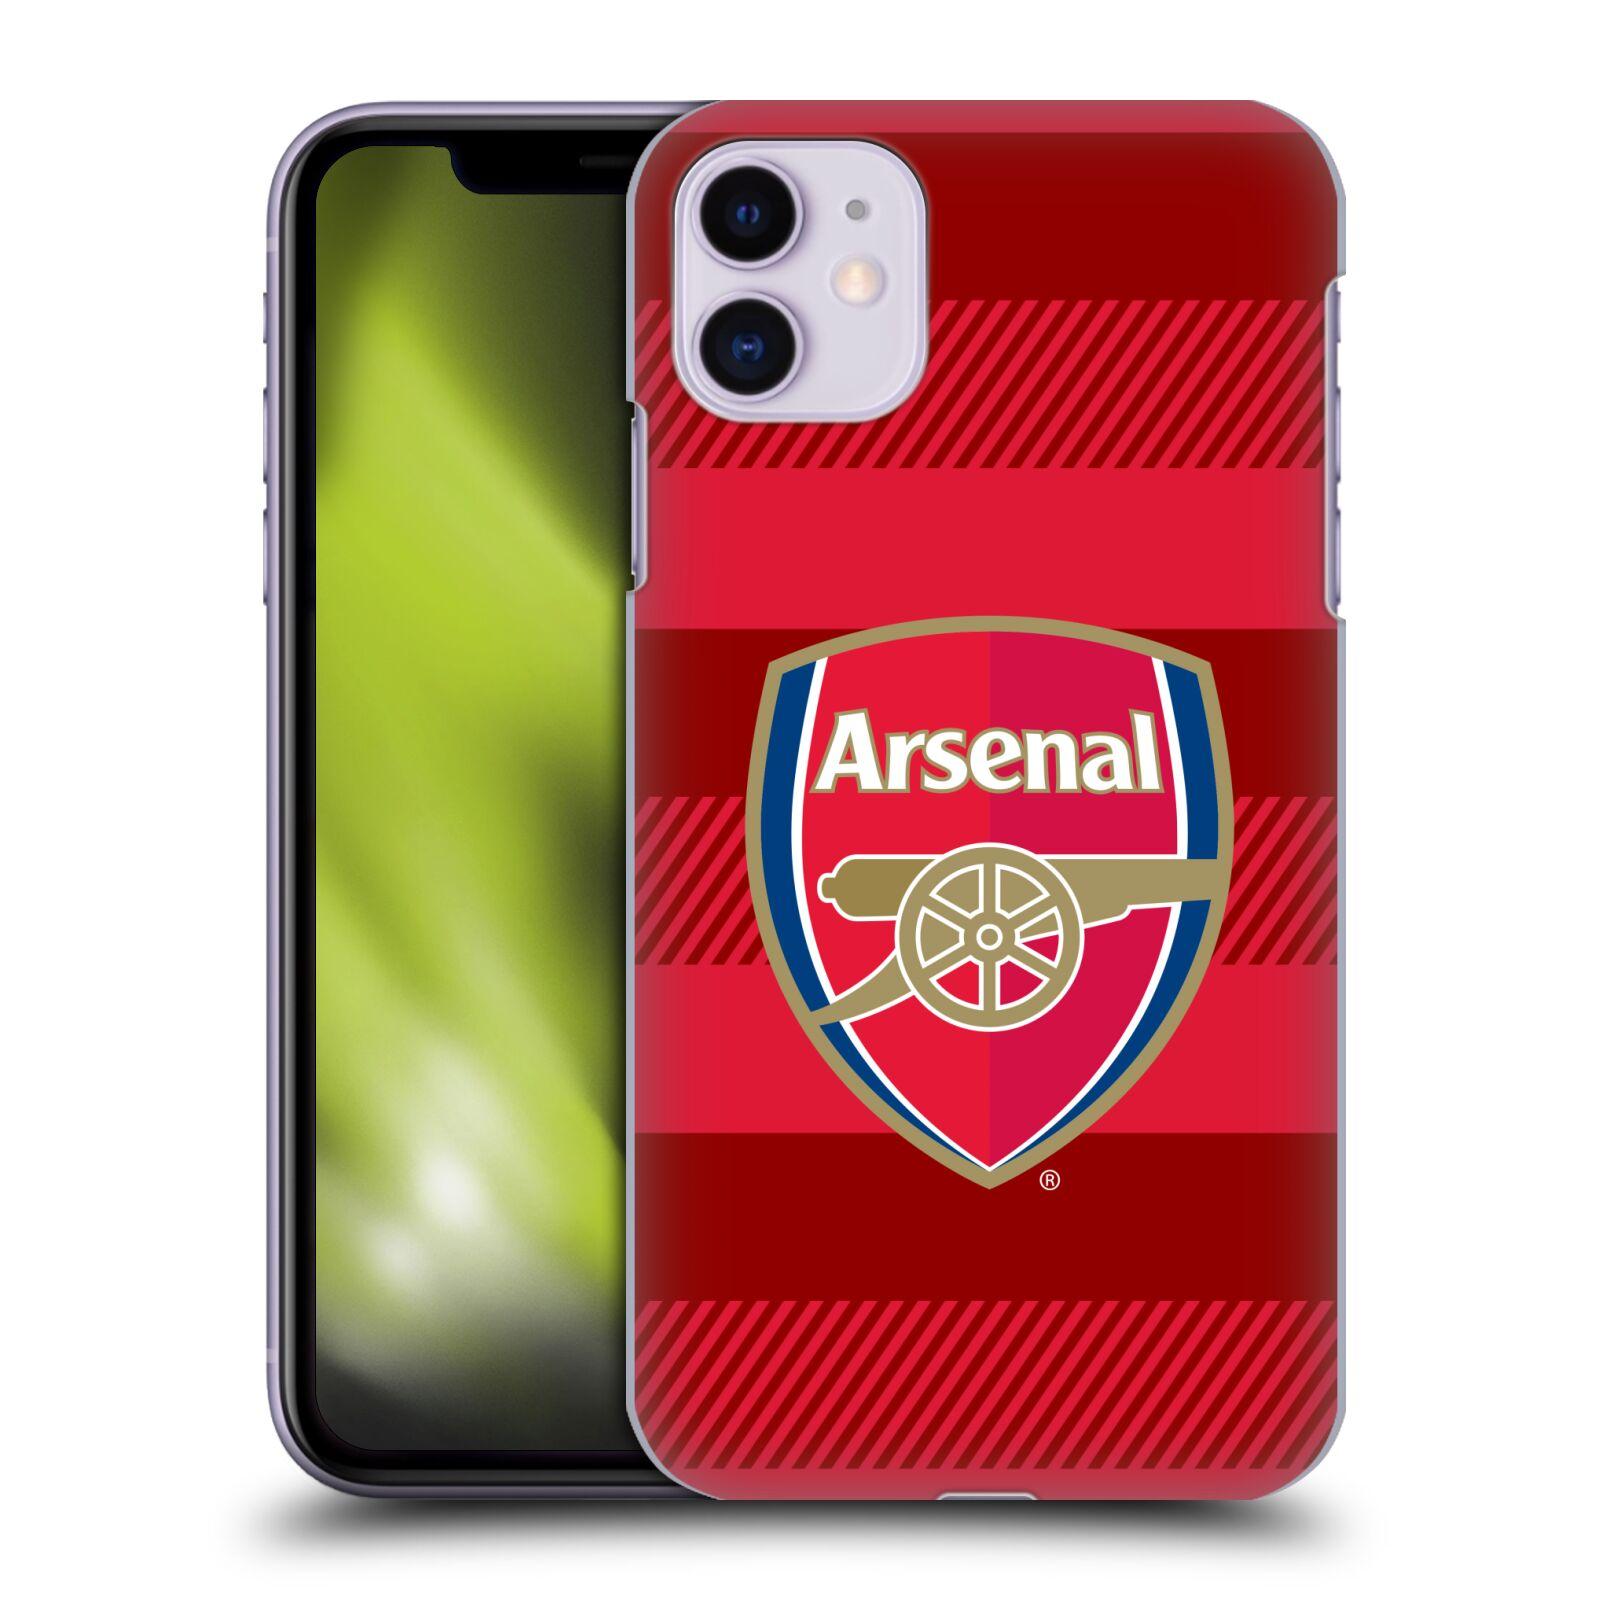 Plastové pouzdro na mobil Apple iPhone 11 - Head Case - Arsenal FC - Logo s pruhy